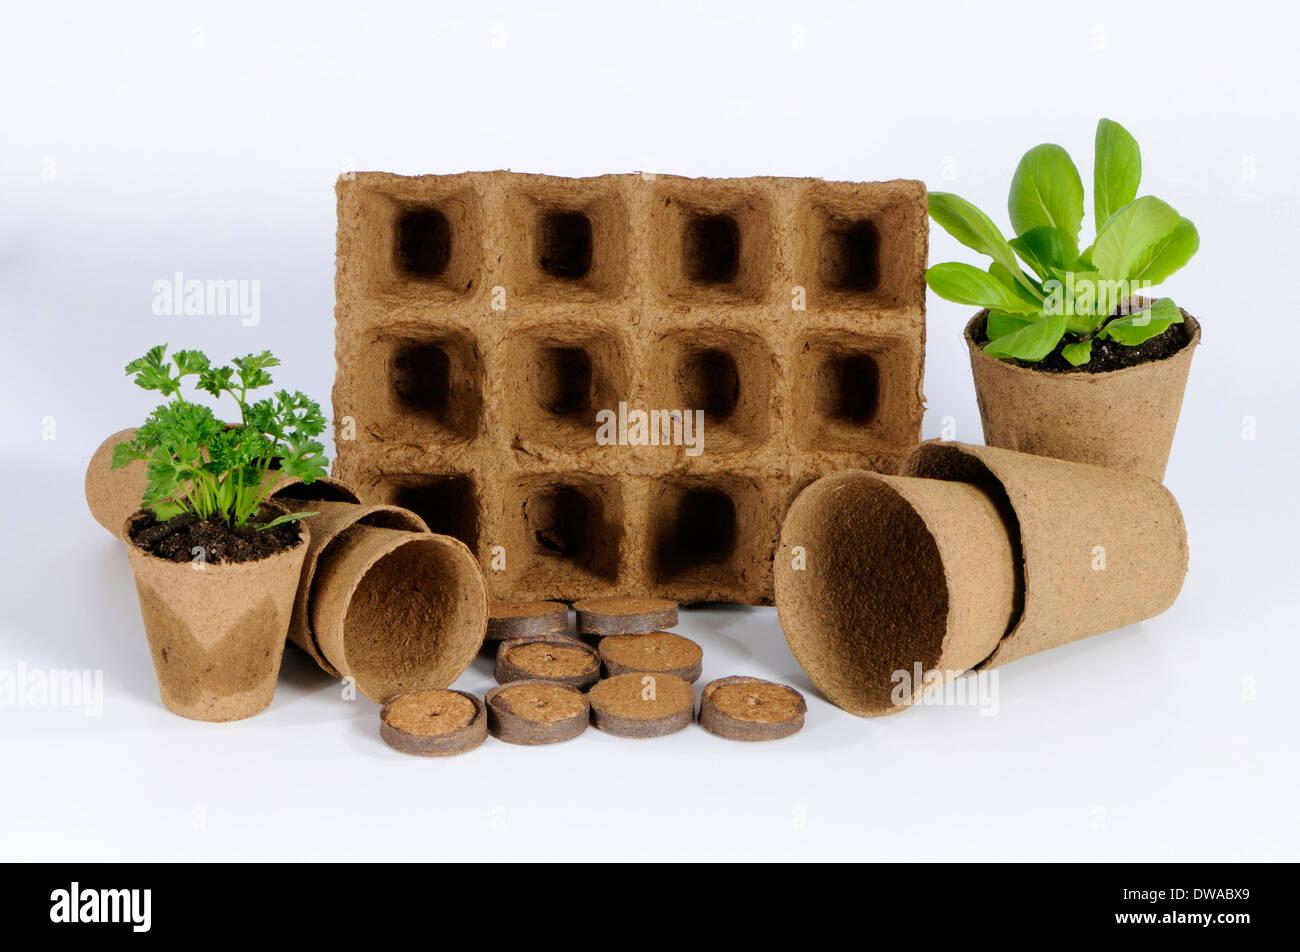 Peat pots - Stock Image